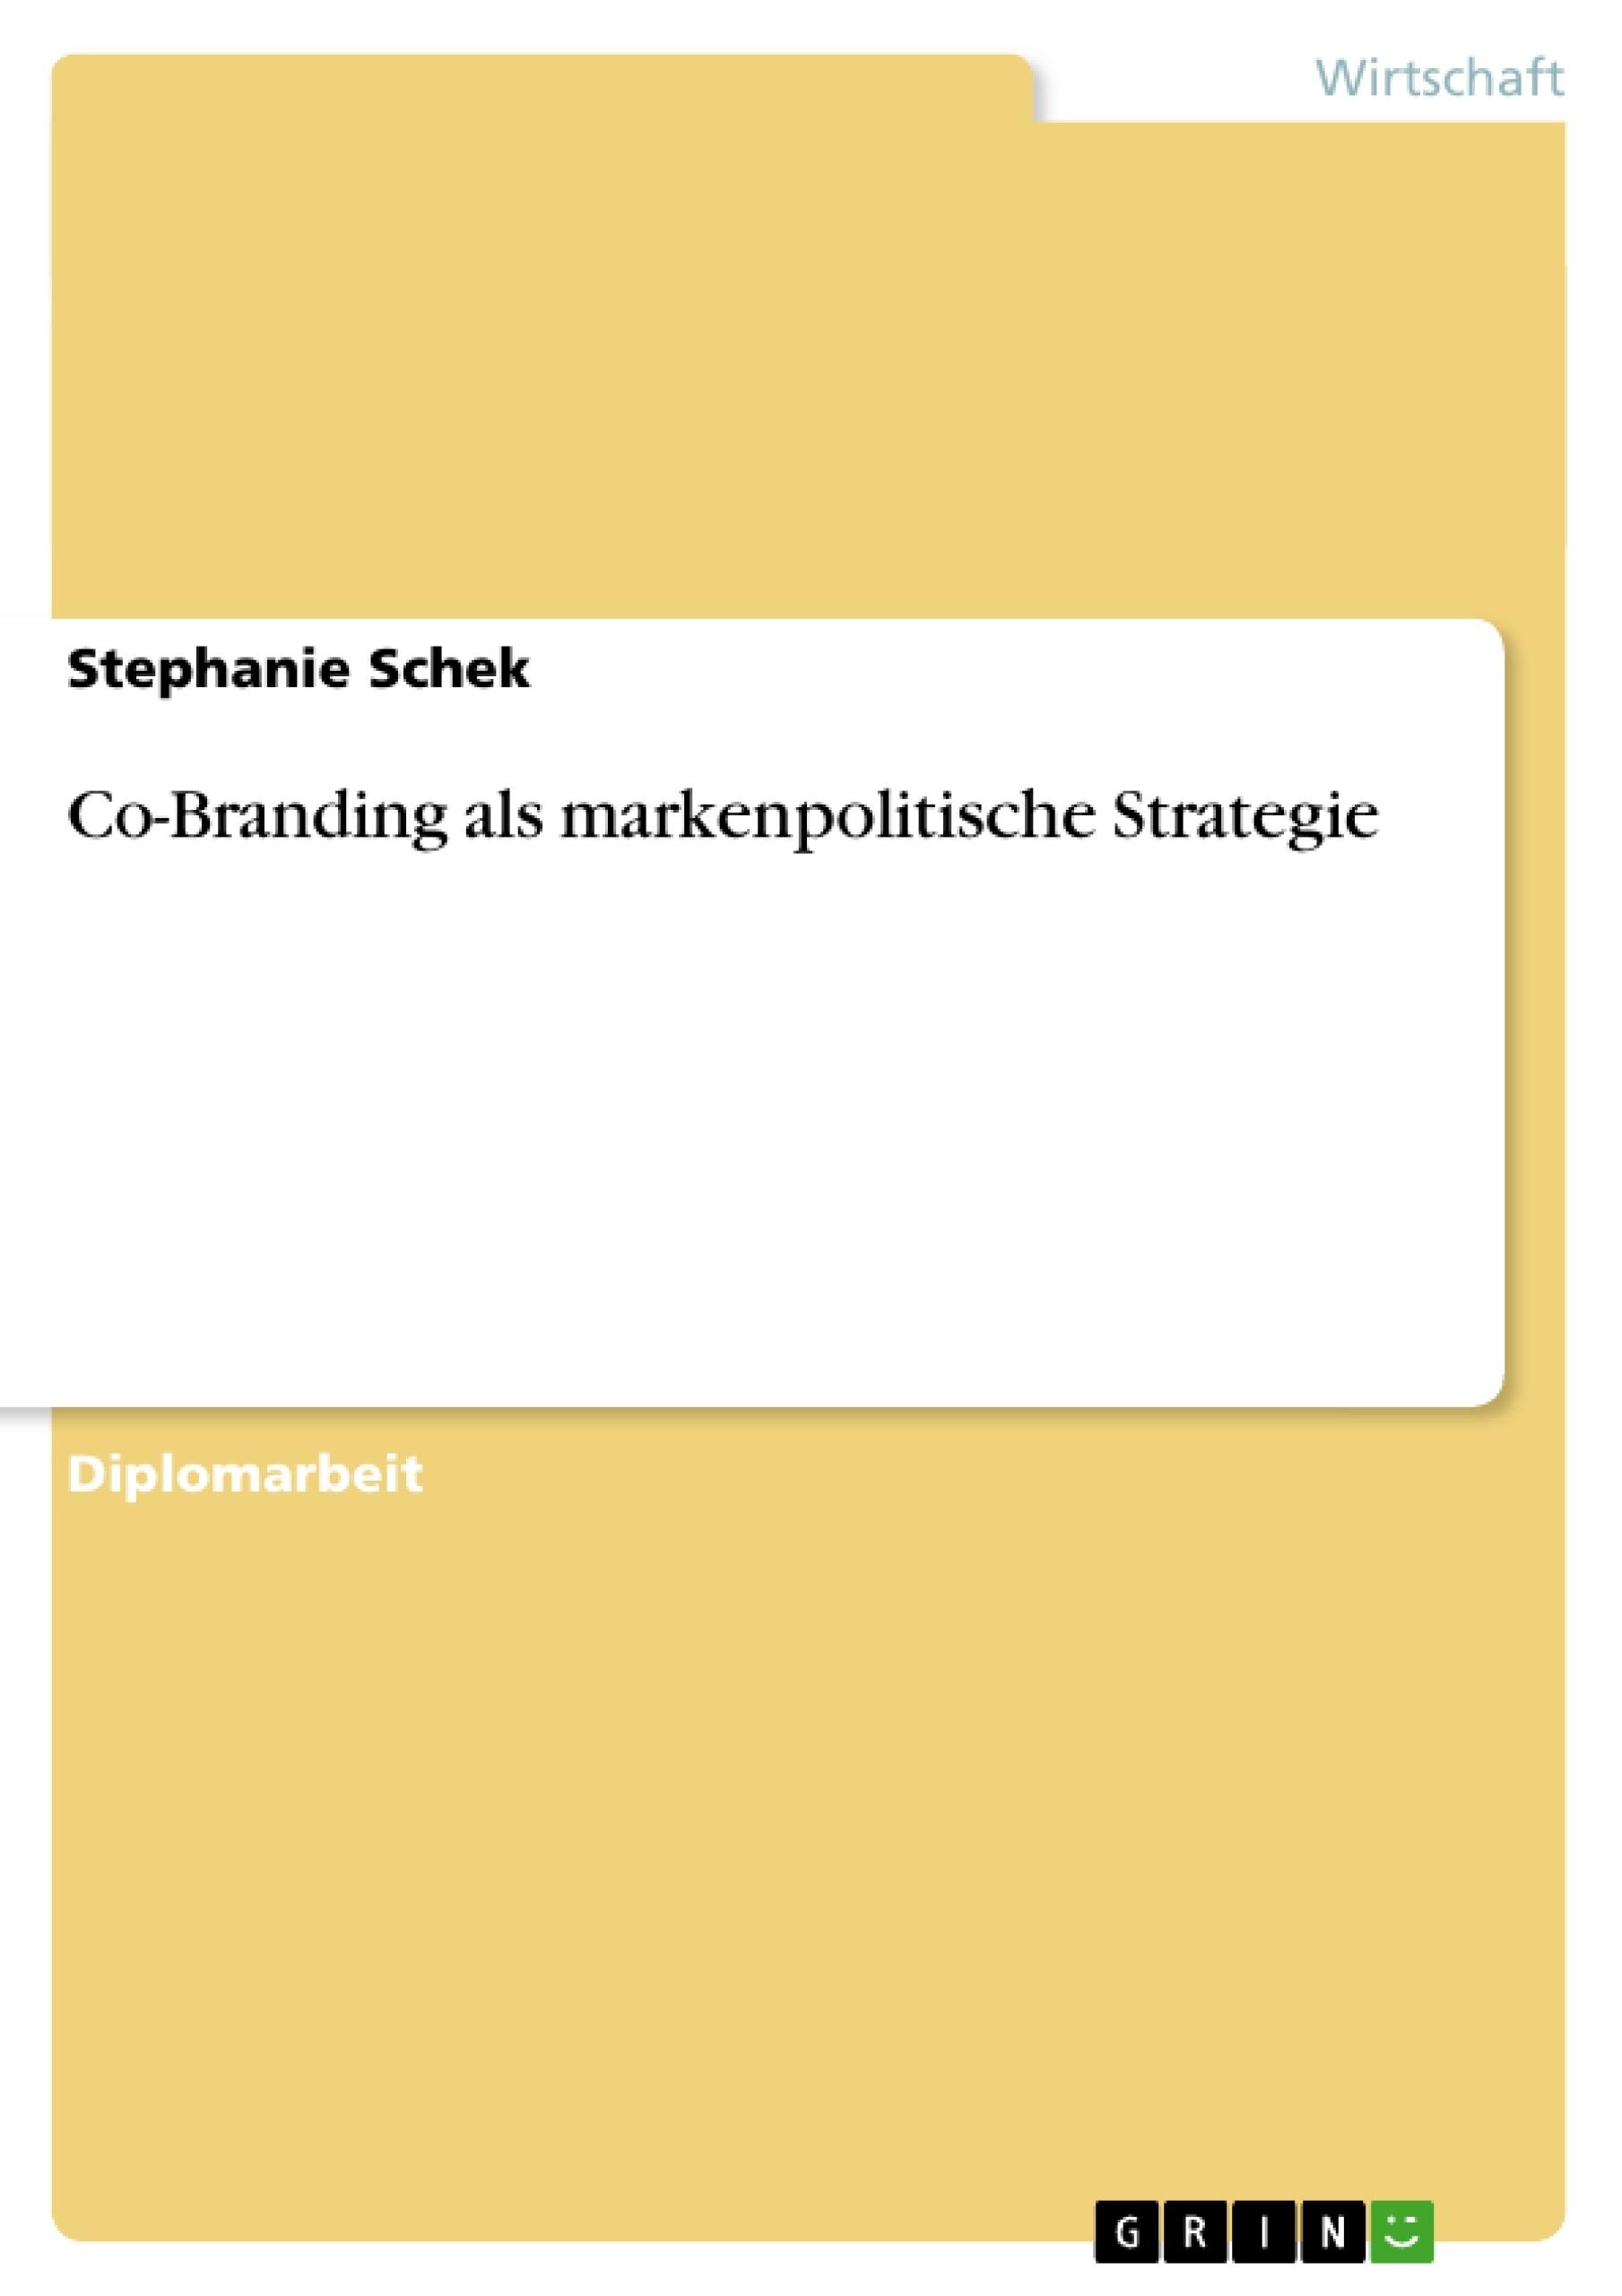 Titel: Co-Branding als markenpolitische Strategie